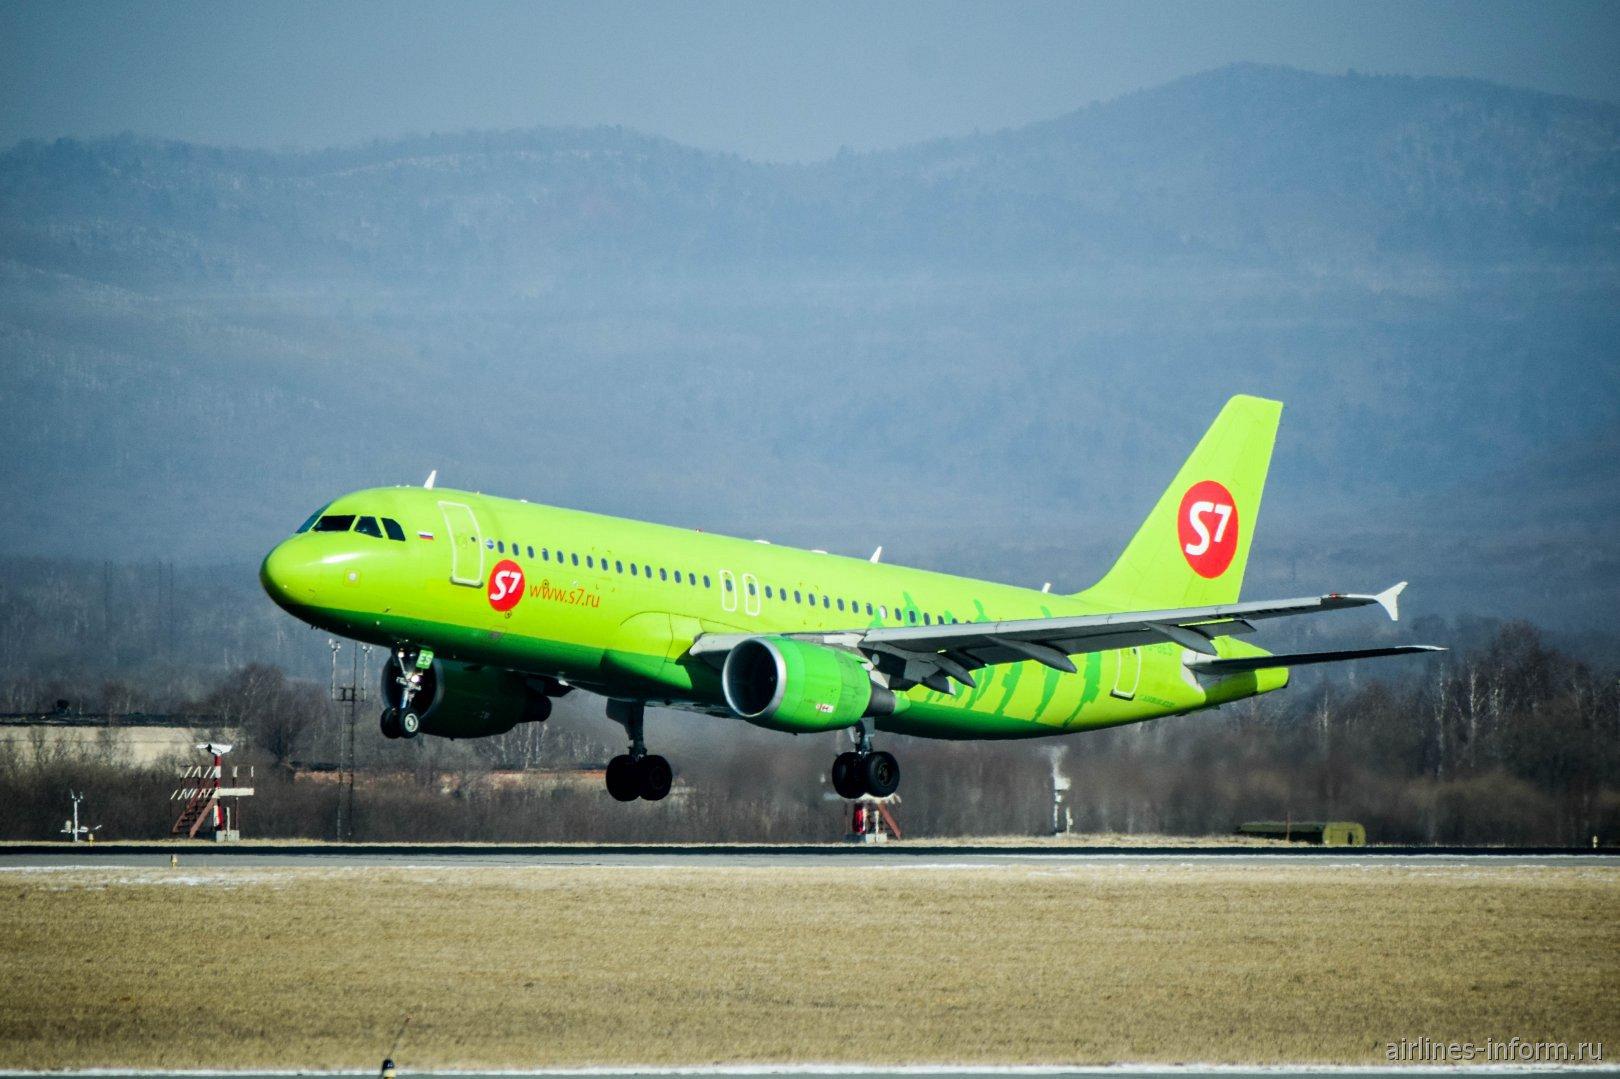 Посадка самолета Airbus A320 авиакомпании S7 Airlines в аэропорту Владивостока